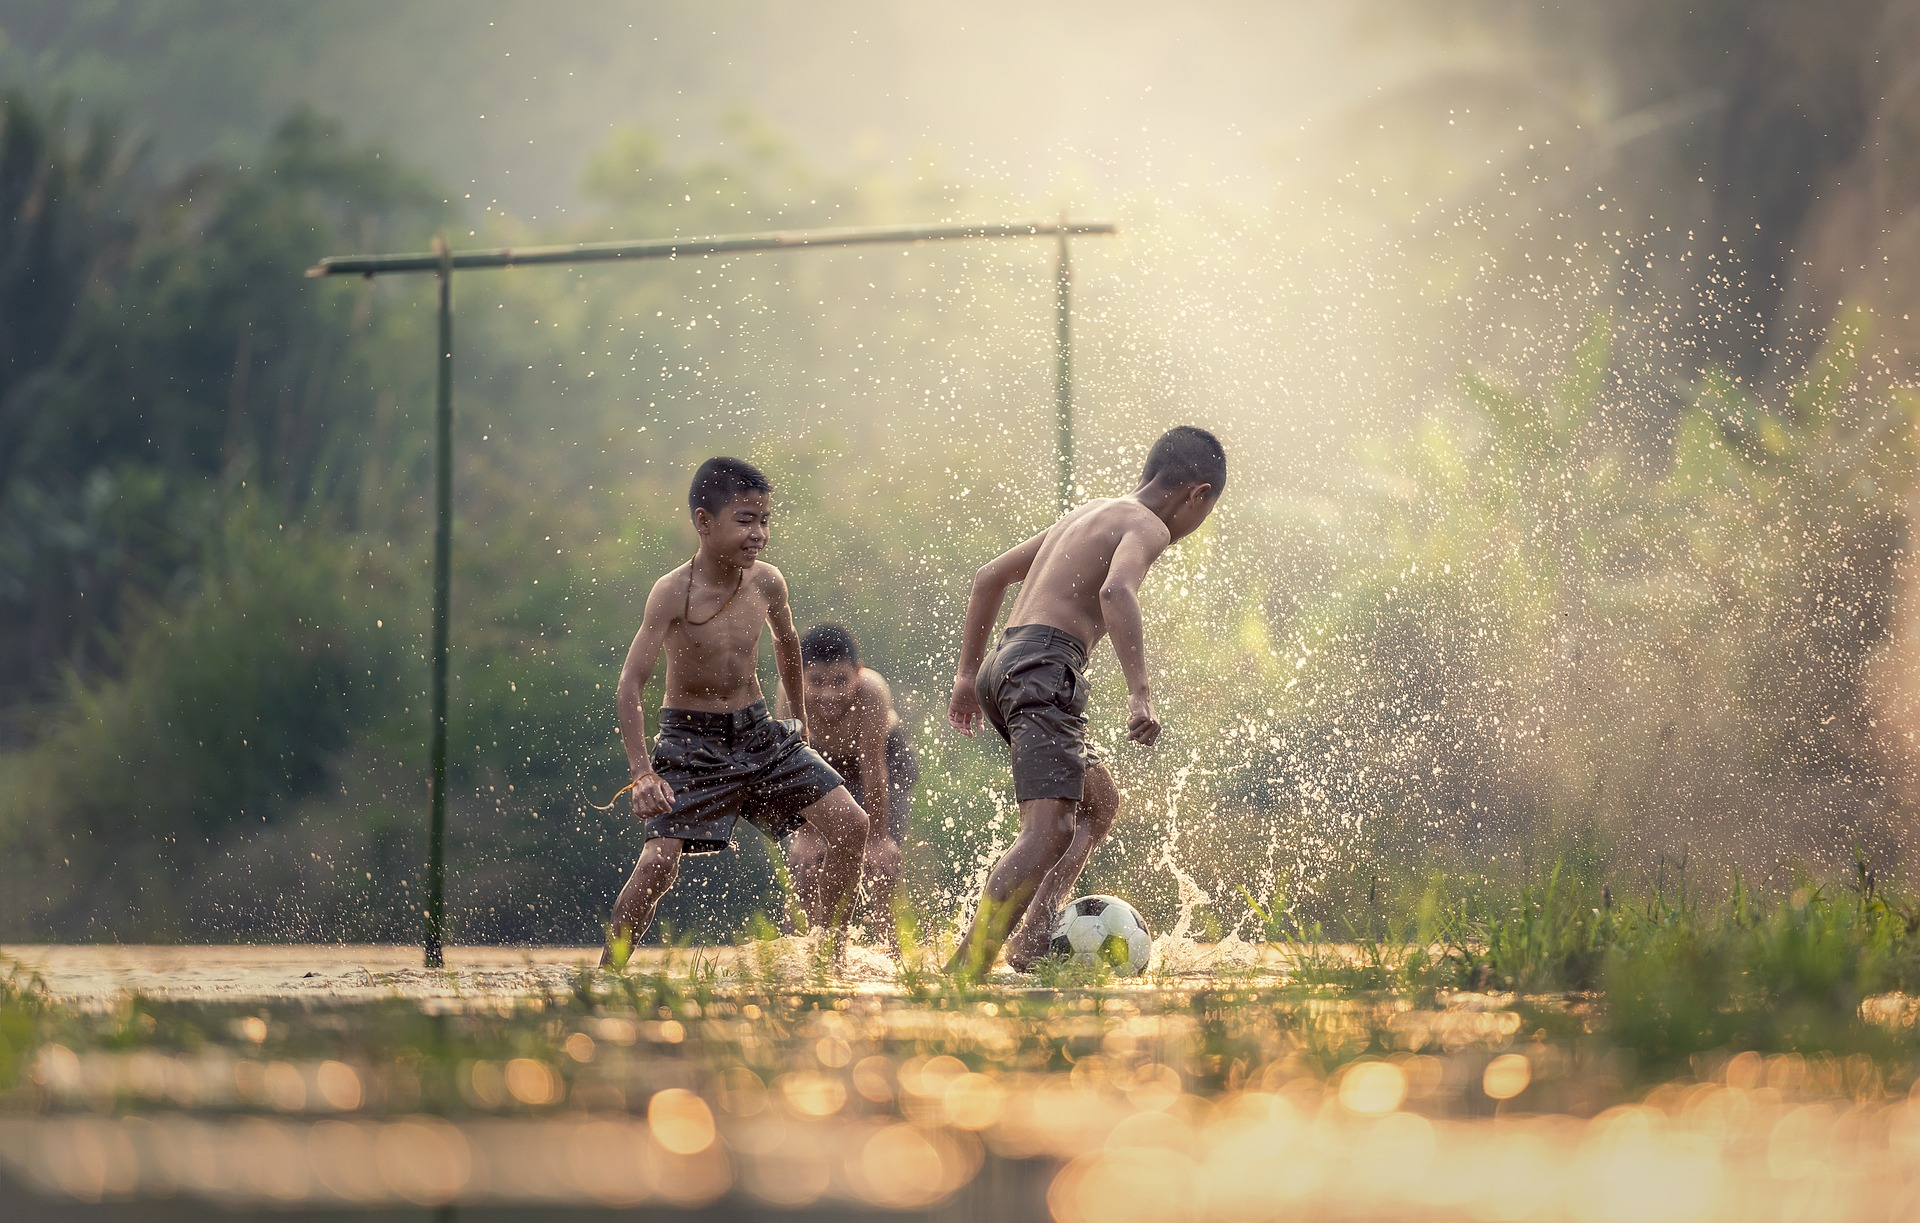 football-1807520_1920.jpg